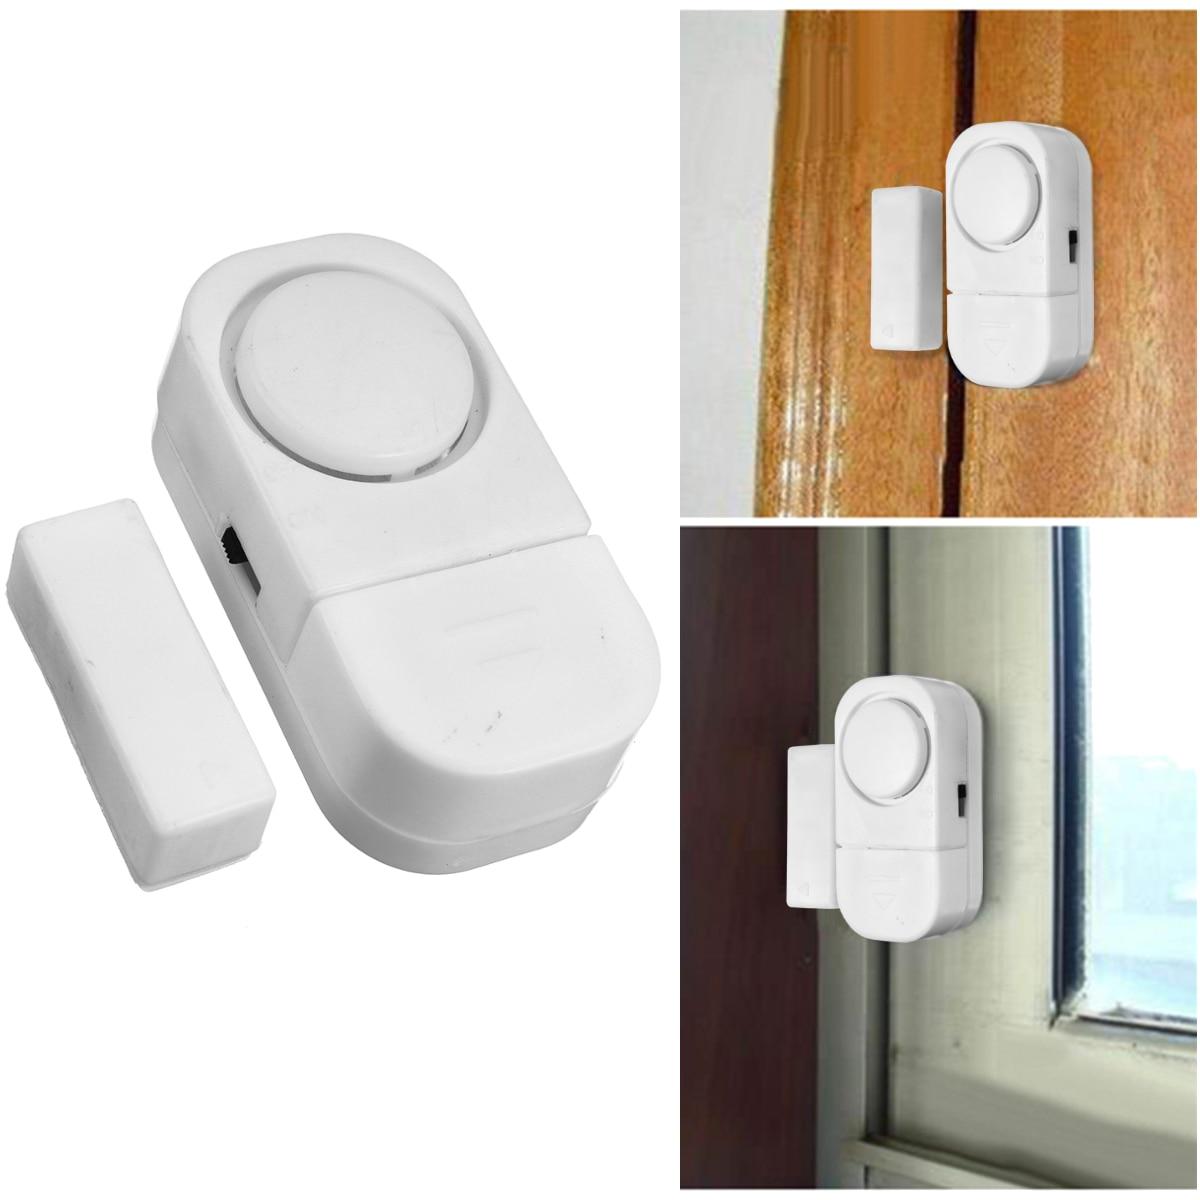 Magnetic Sensors Independent Wireless Home Window Door Entry Burglar Security Alarm System